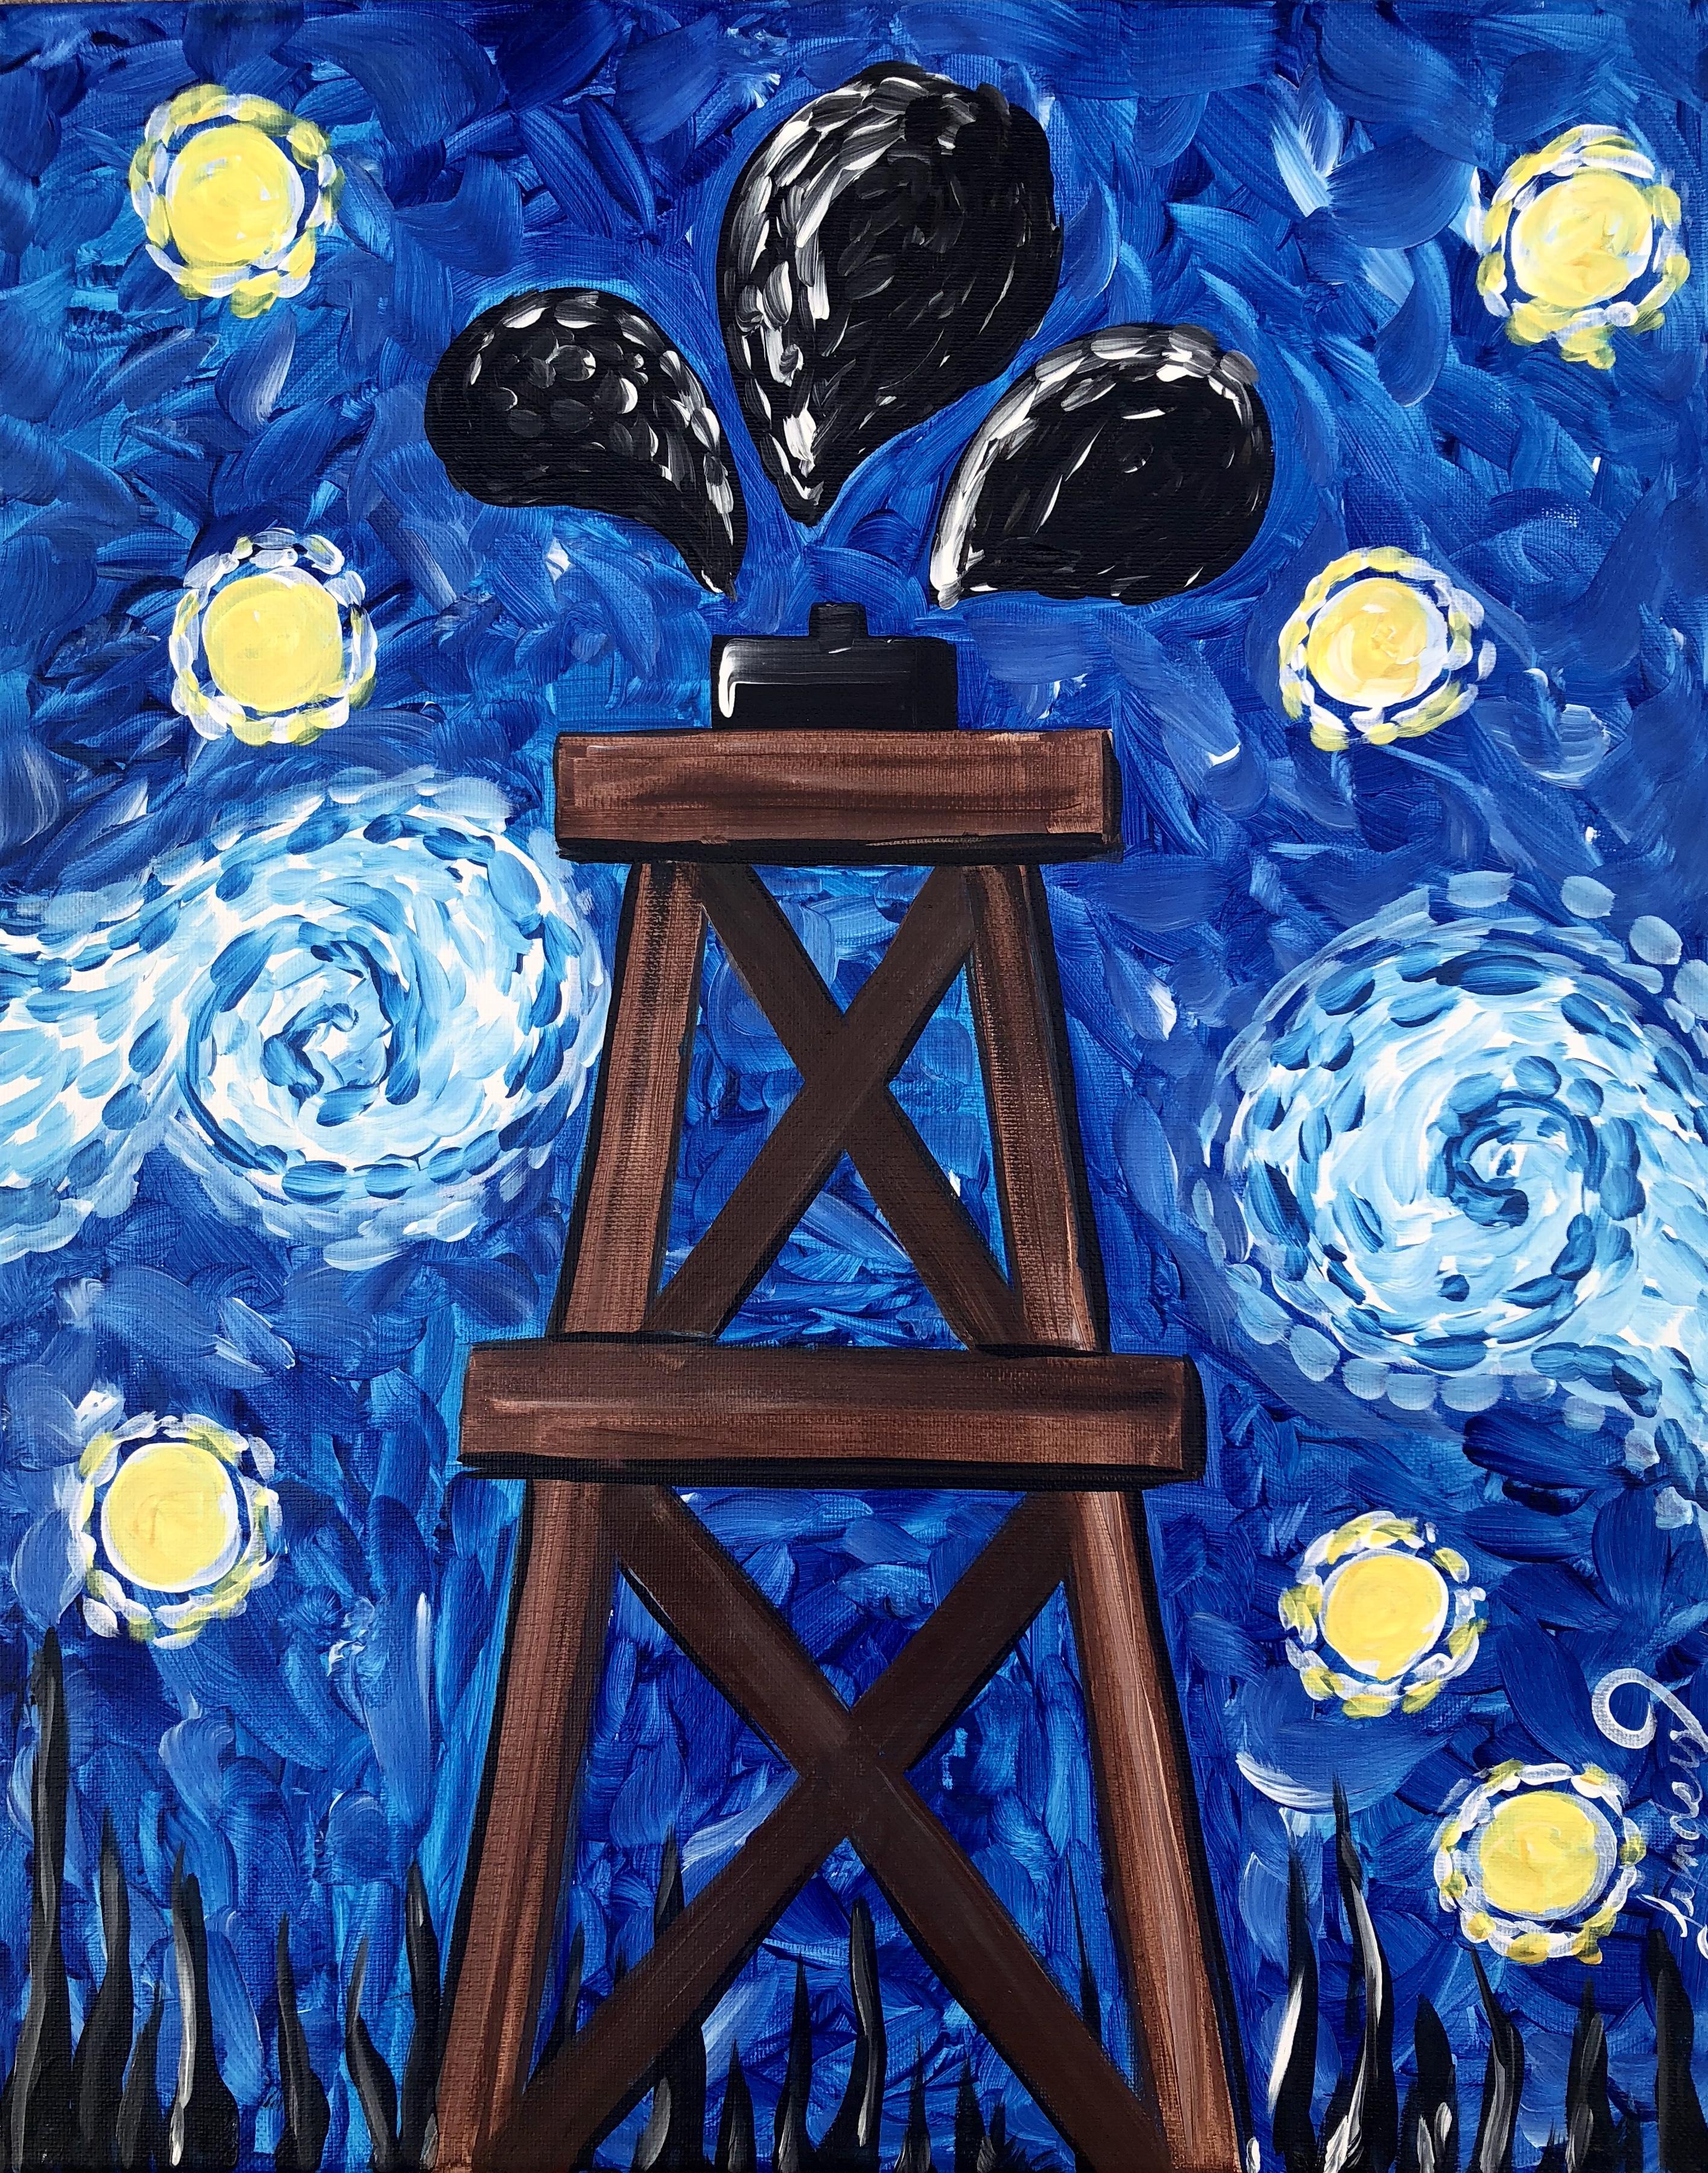 Starry Oil